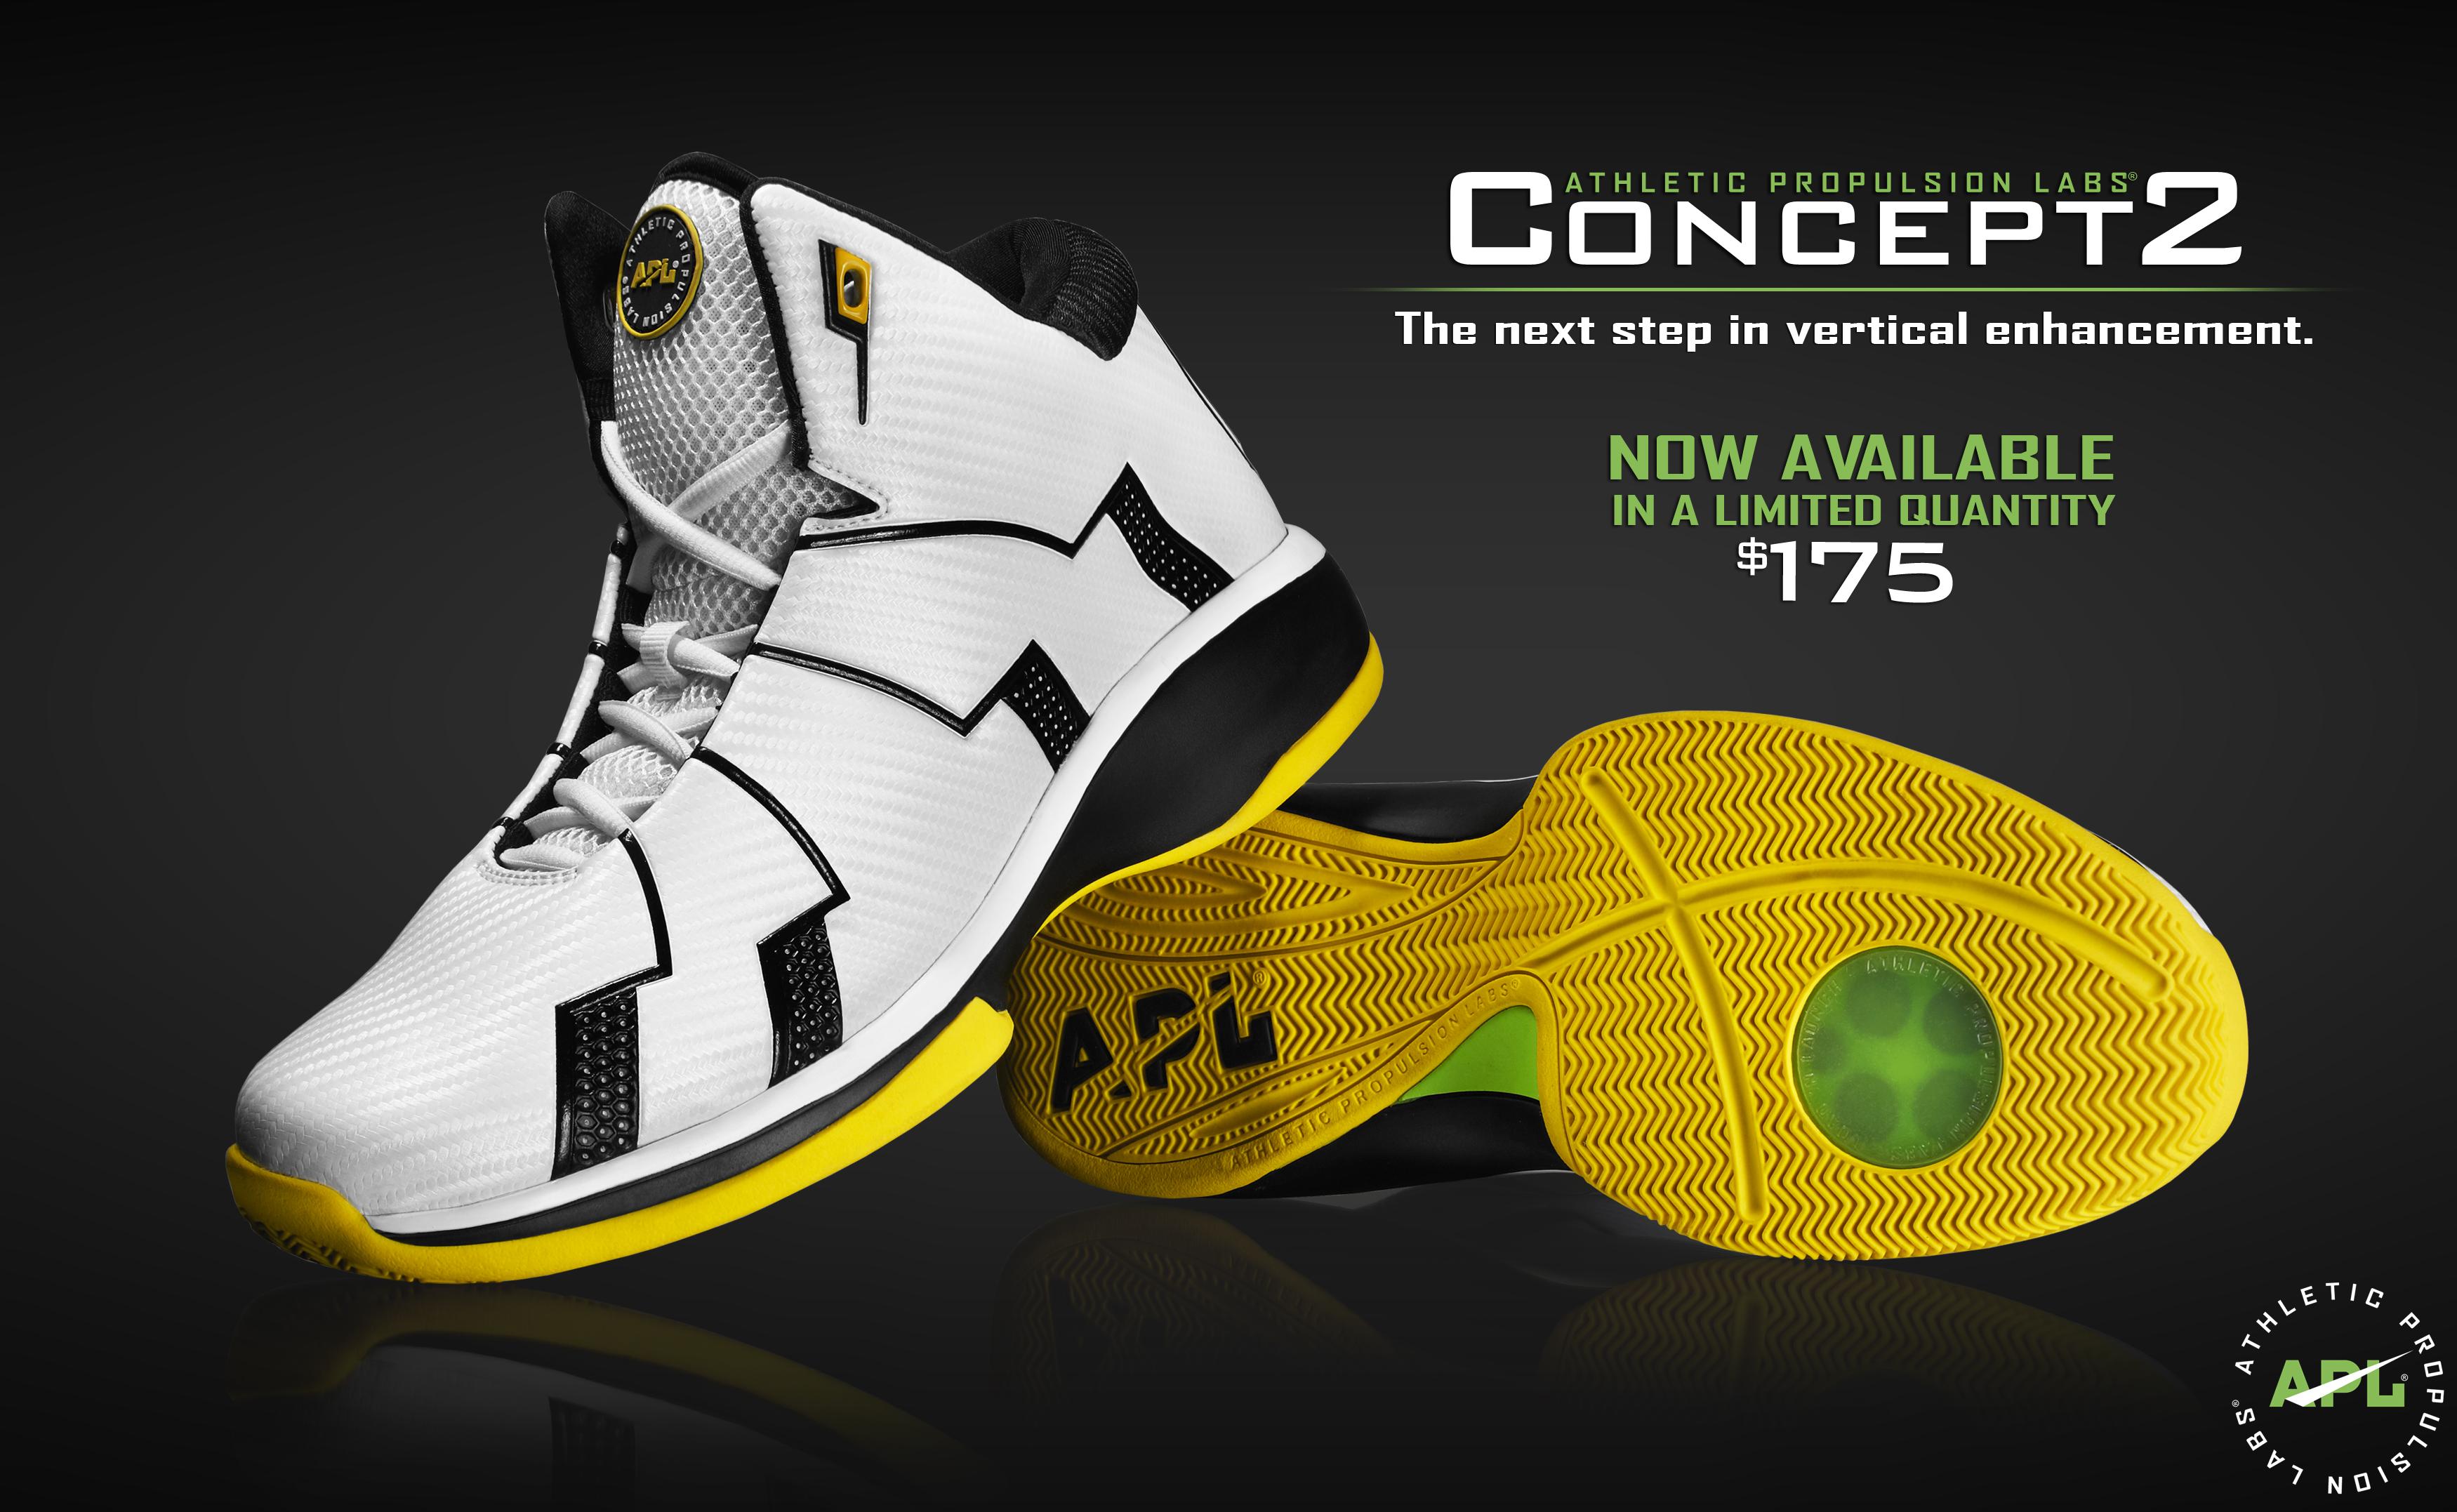 half off 1b49a 1e2a6 Athletic Propulsion Labs APL Concept 2 Basketball ShoesAthletic Propulsion  Labs APL Concept 2 Basketball Shoes ...